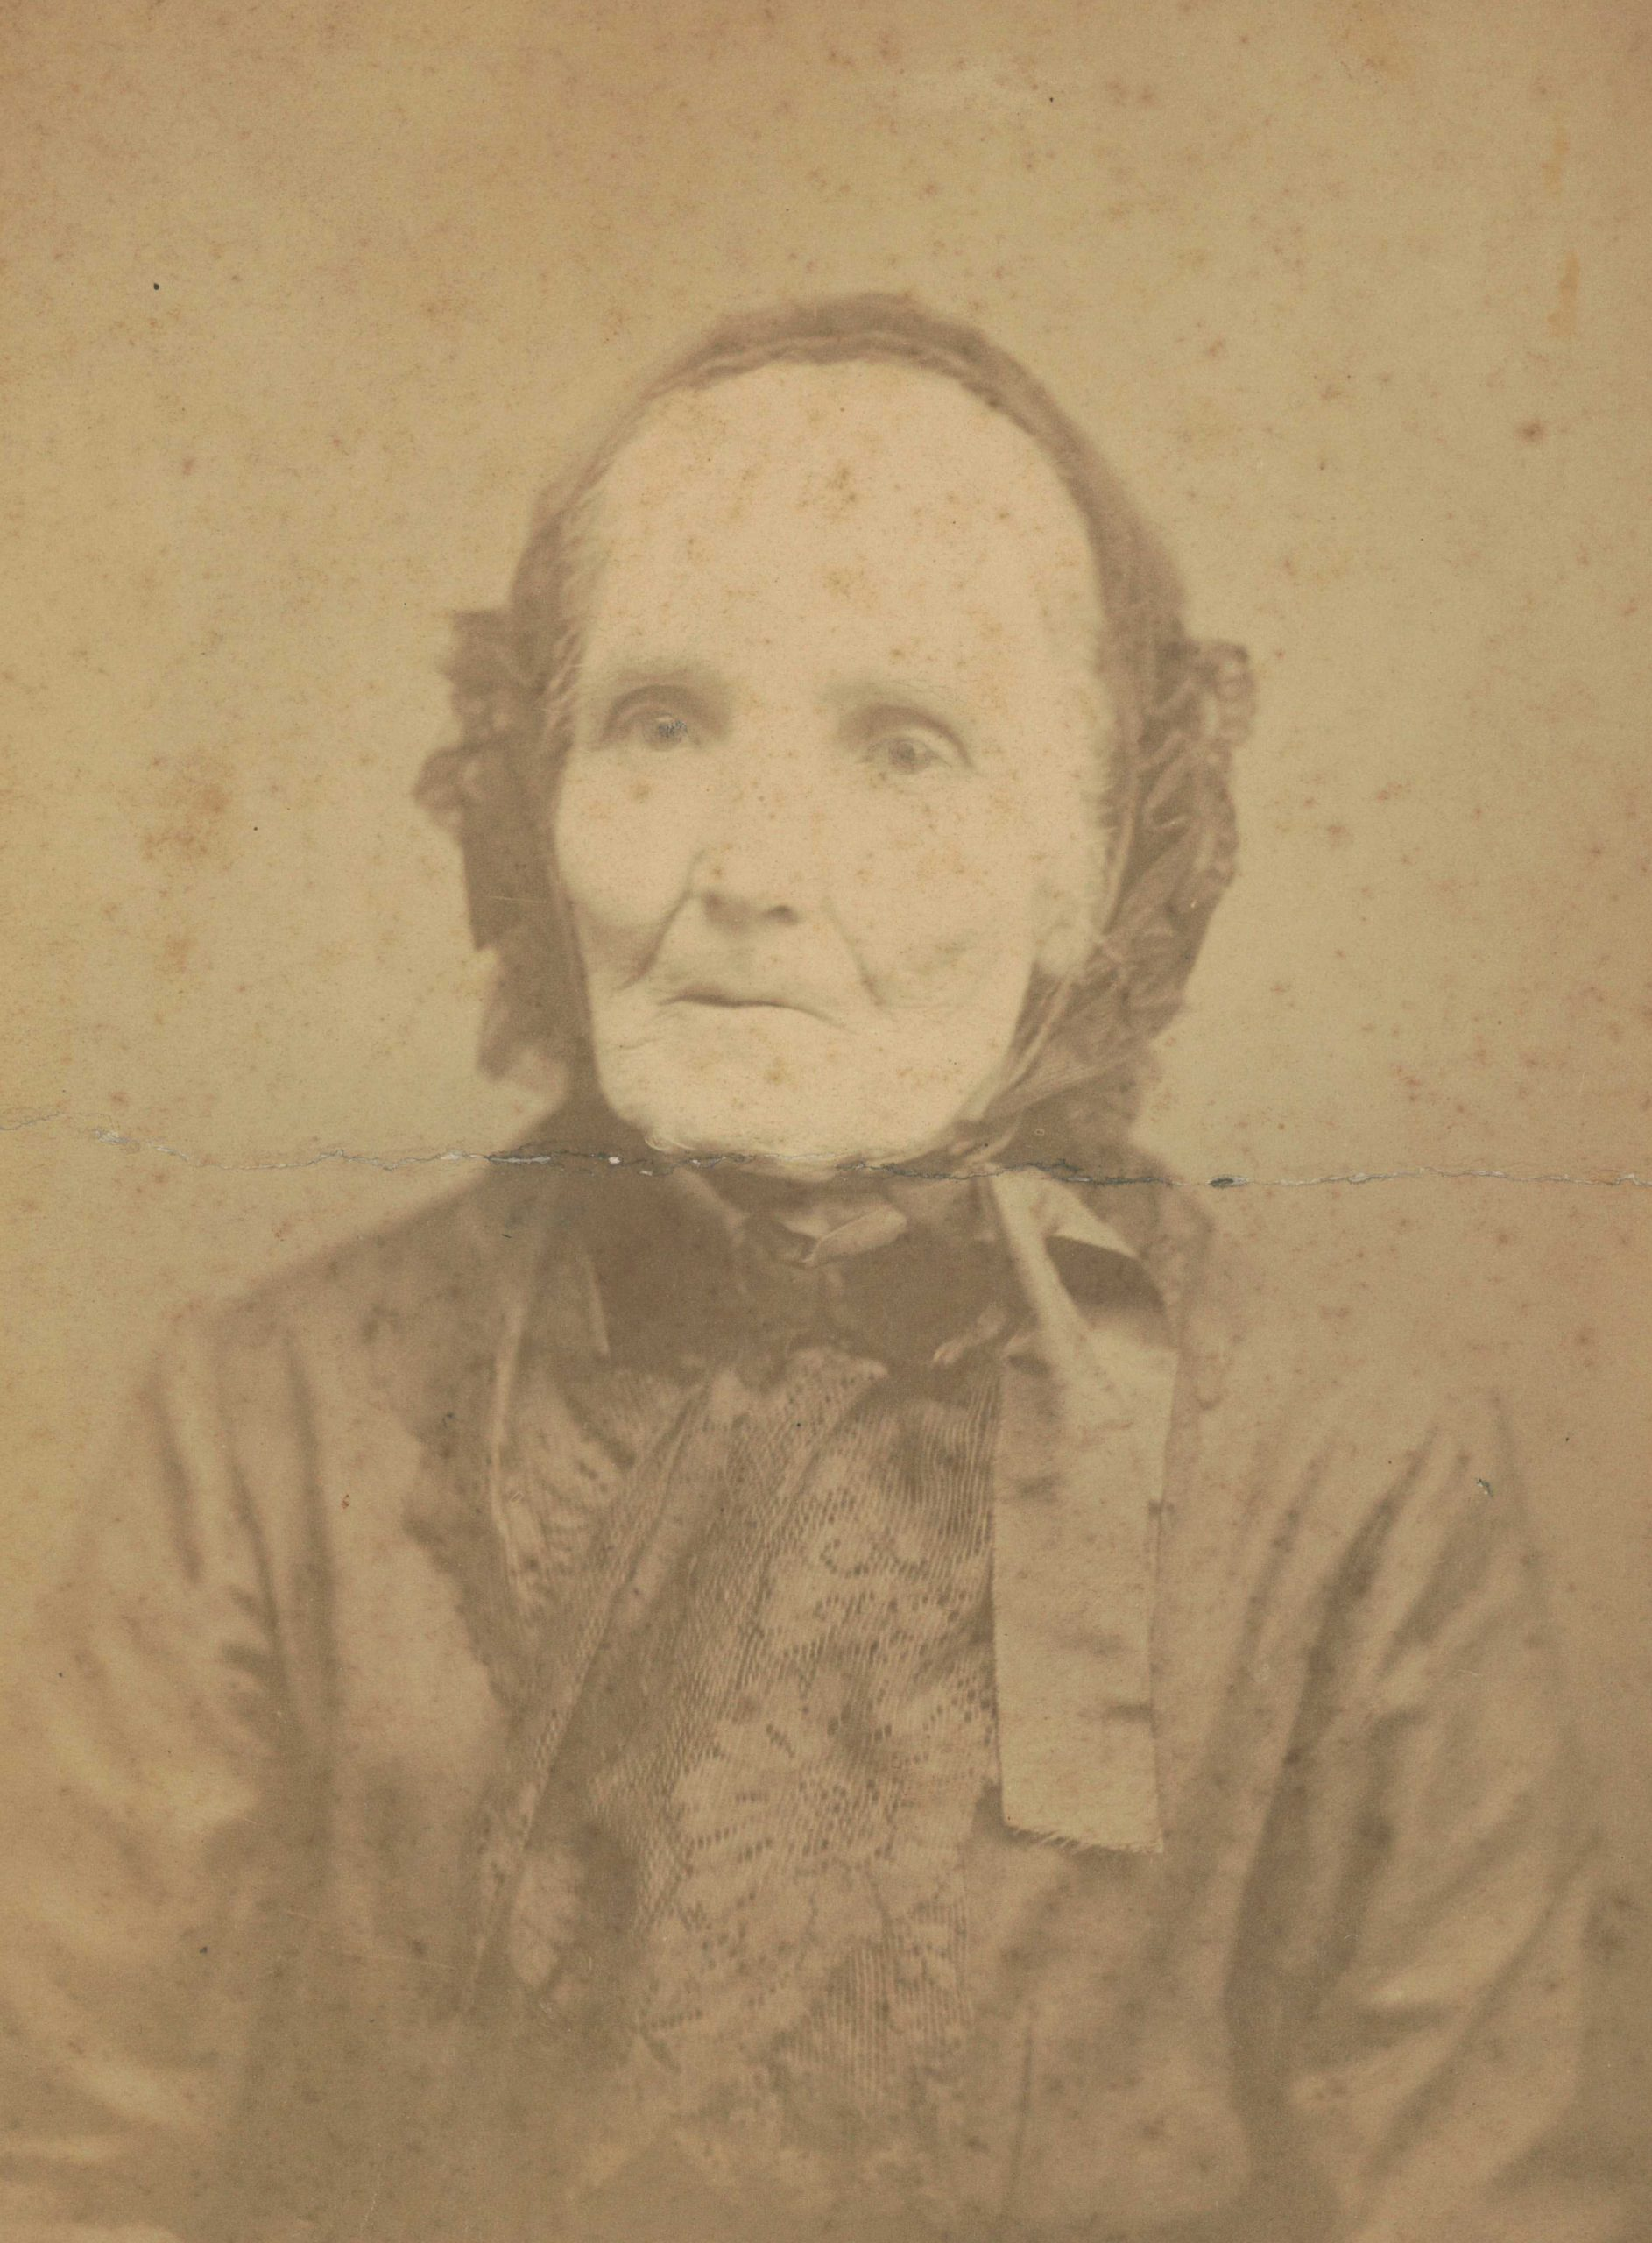 Matilda Thomas